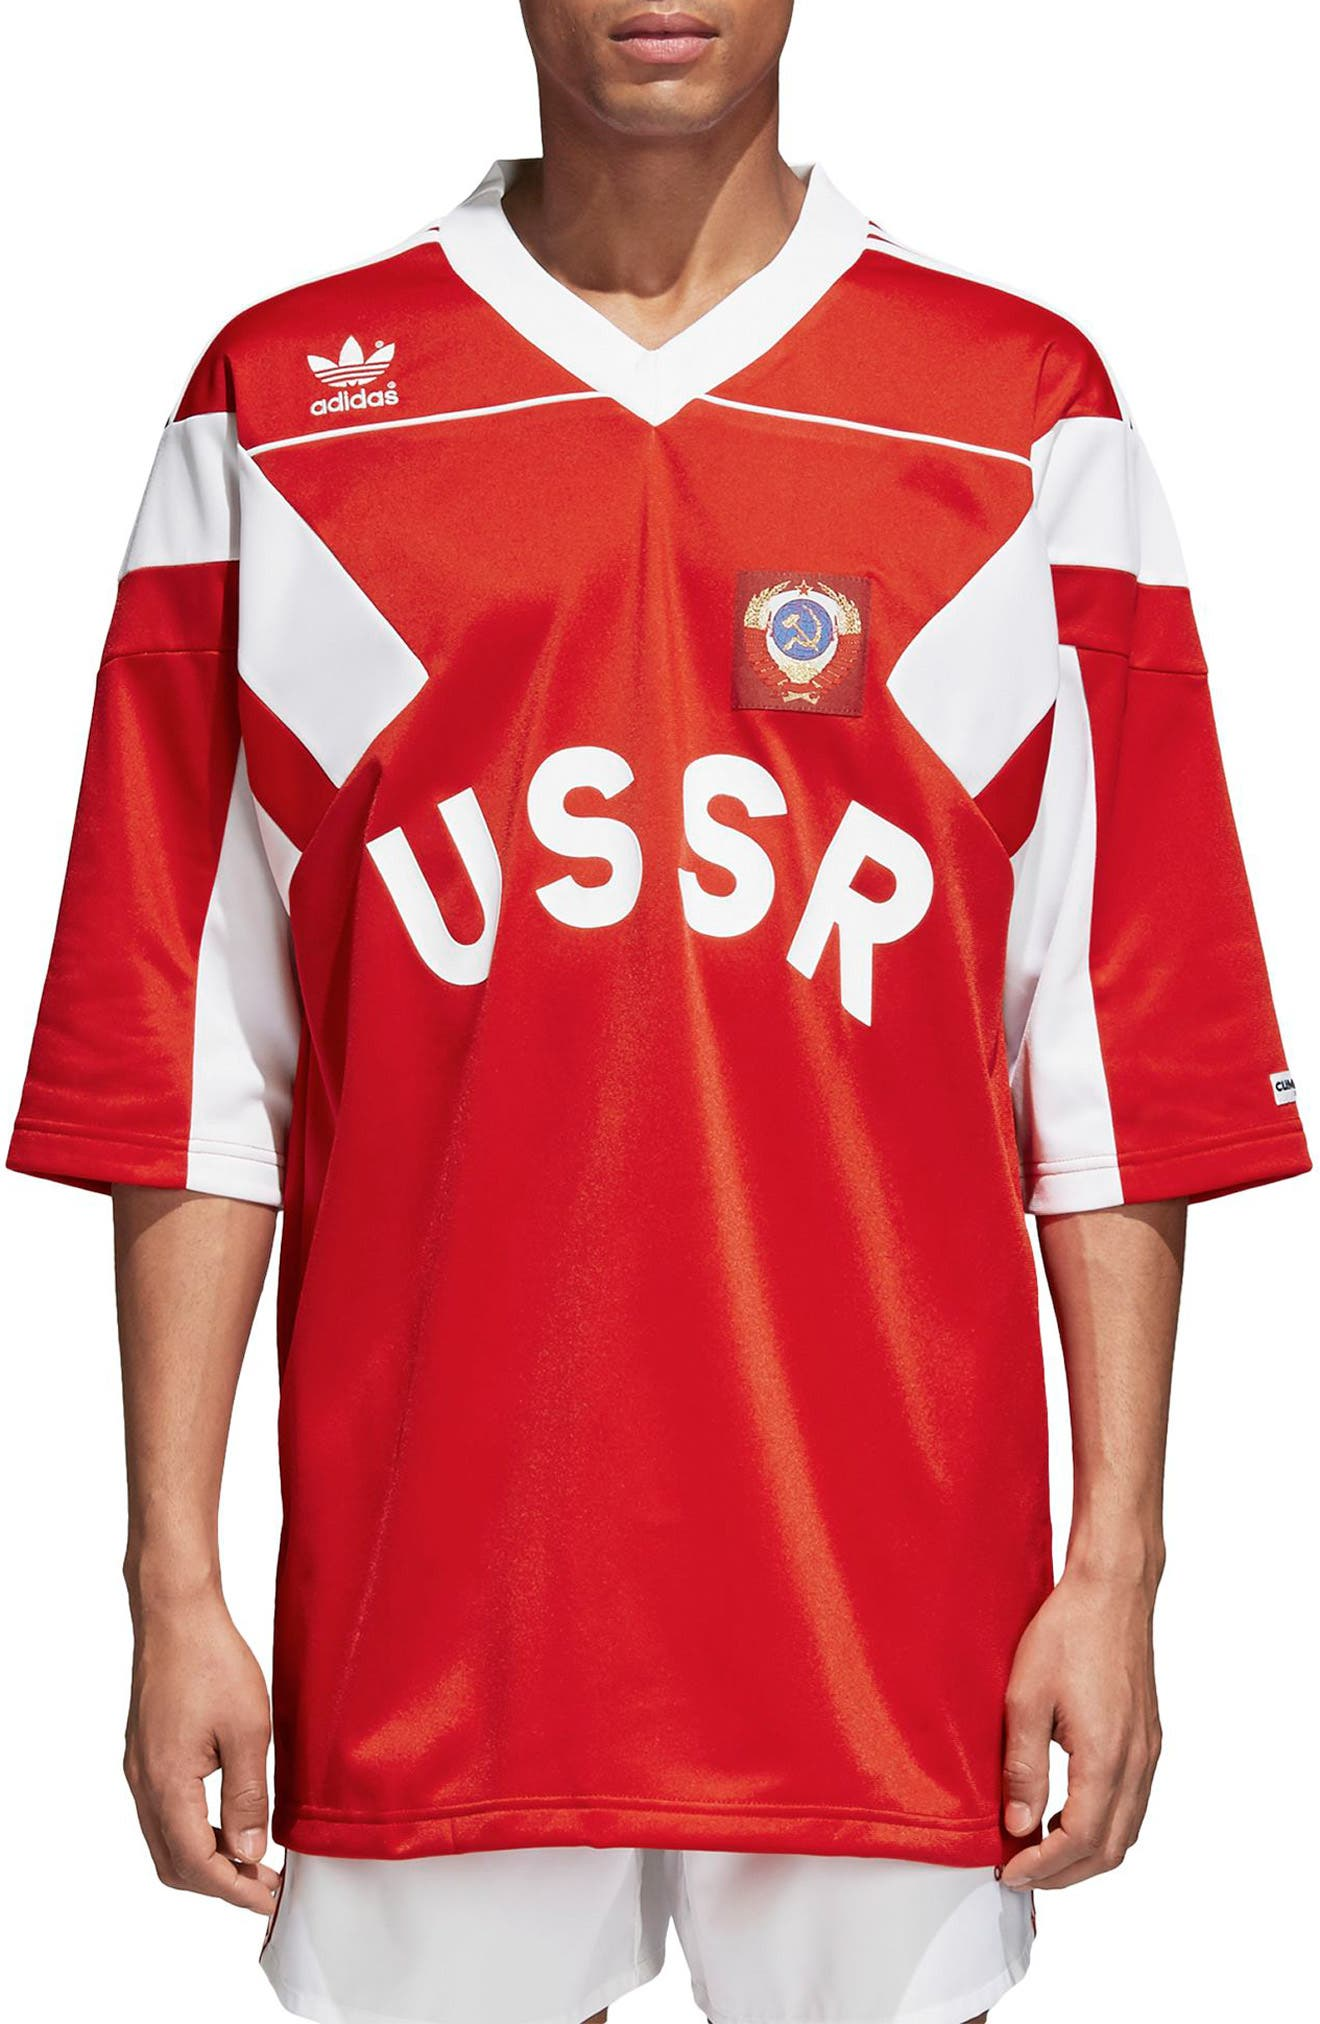 adidas Original Russia 1991 Soccer Jersey,                             Main thumbnail 1, color,                             610